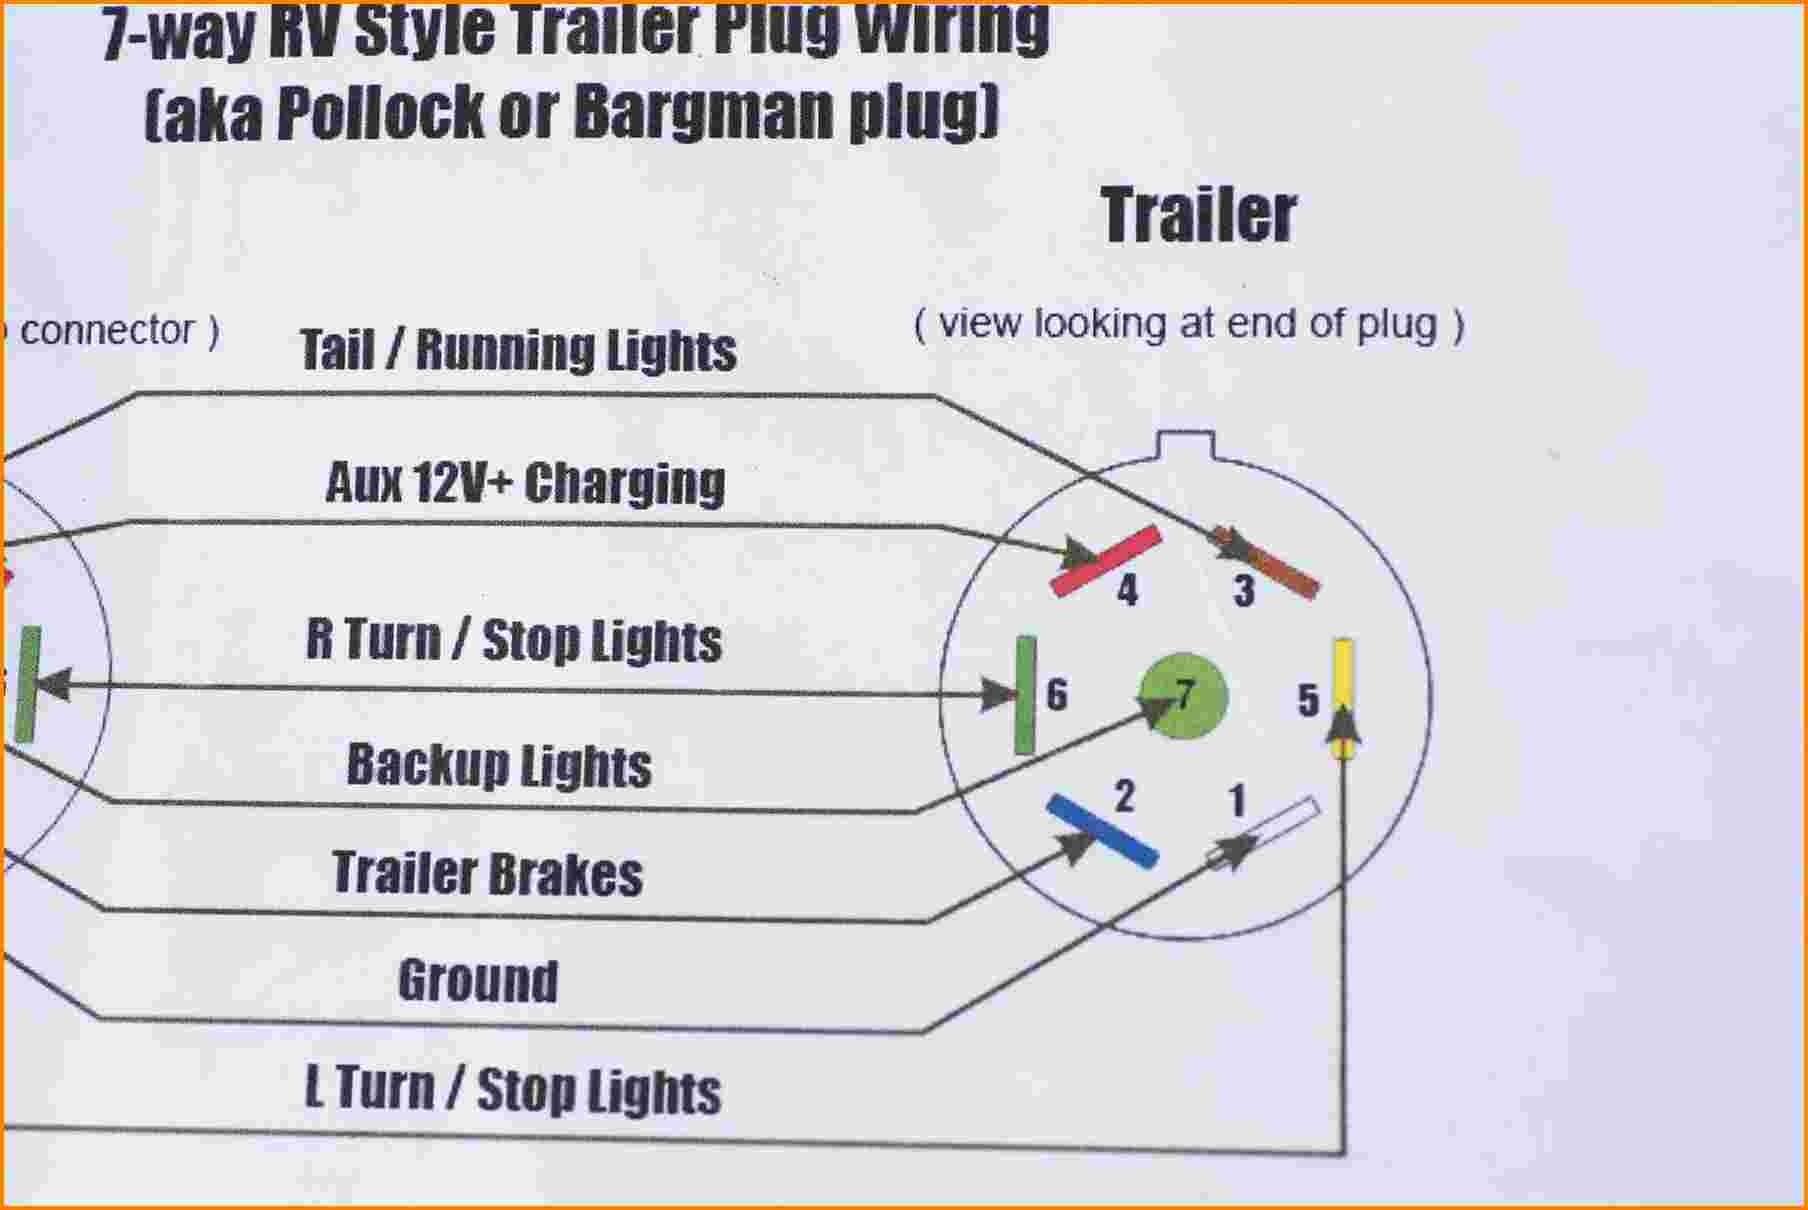 Tractor Trailer Wiring Diagram Beautiful Pollak Trailer Wiring Diagram Everything You Need Of Tractor Trailer Wiring Diagram